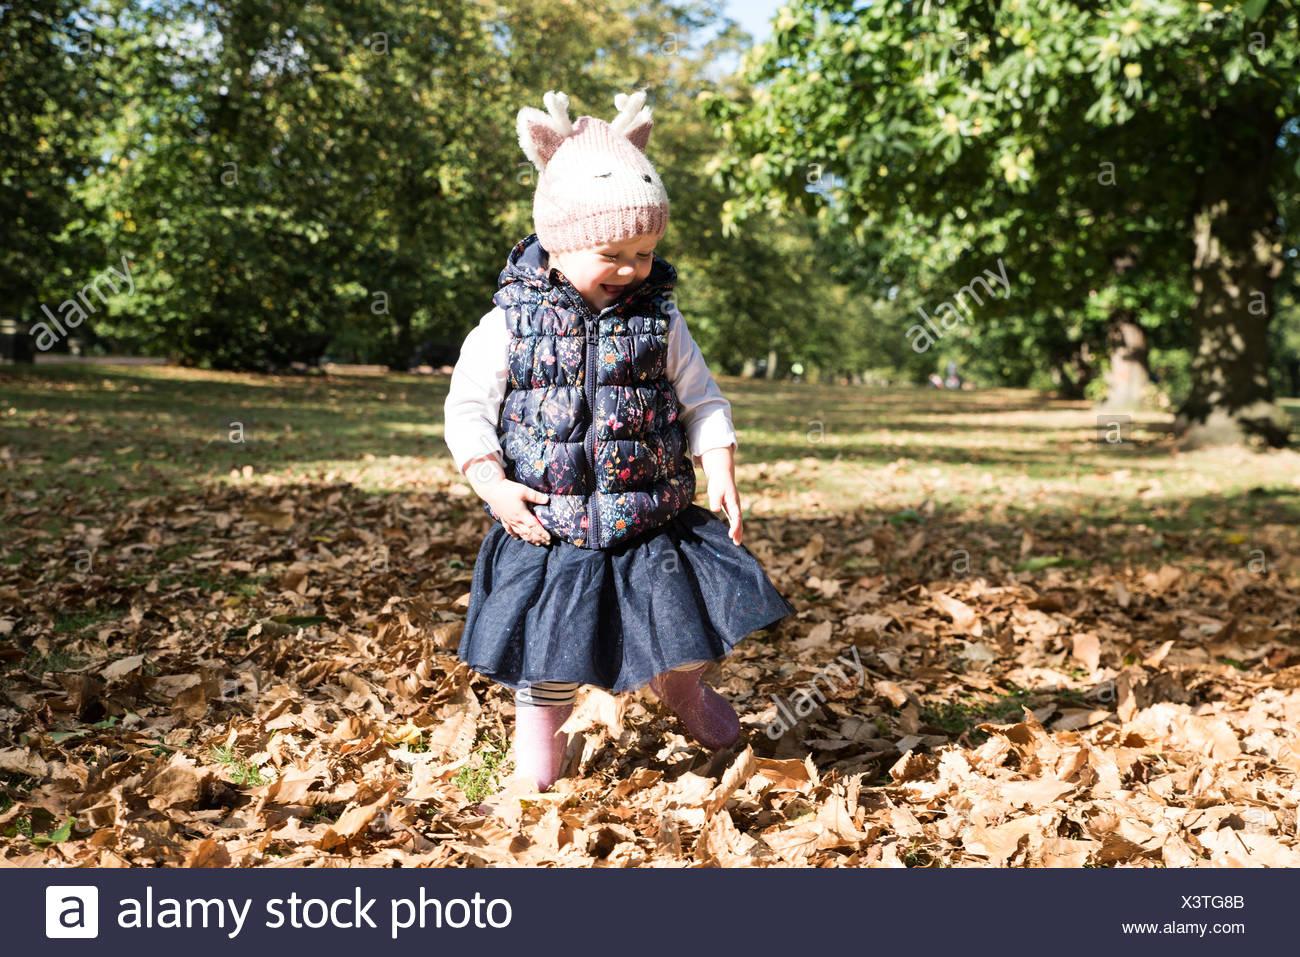 Female toddler toddling amongst autumn leaves in park - Stock Image